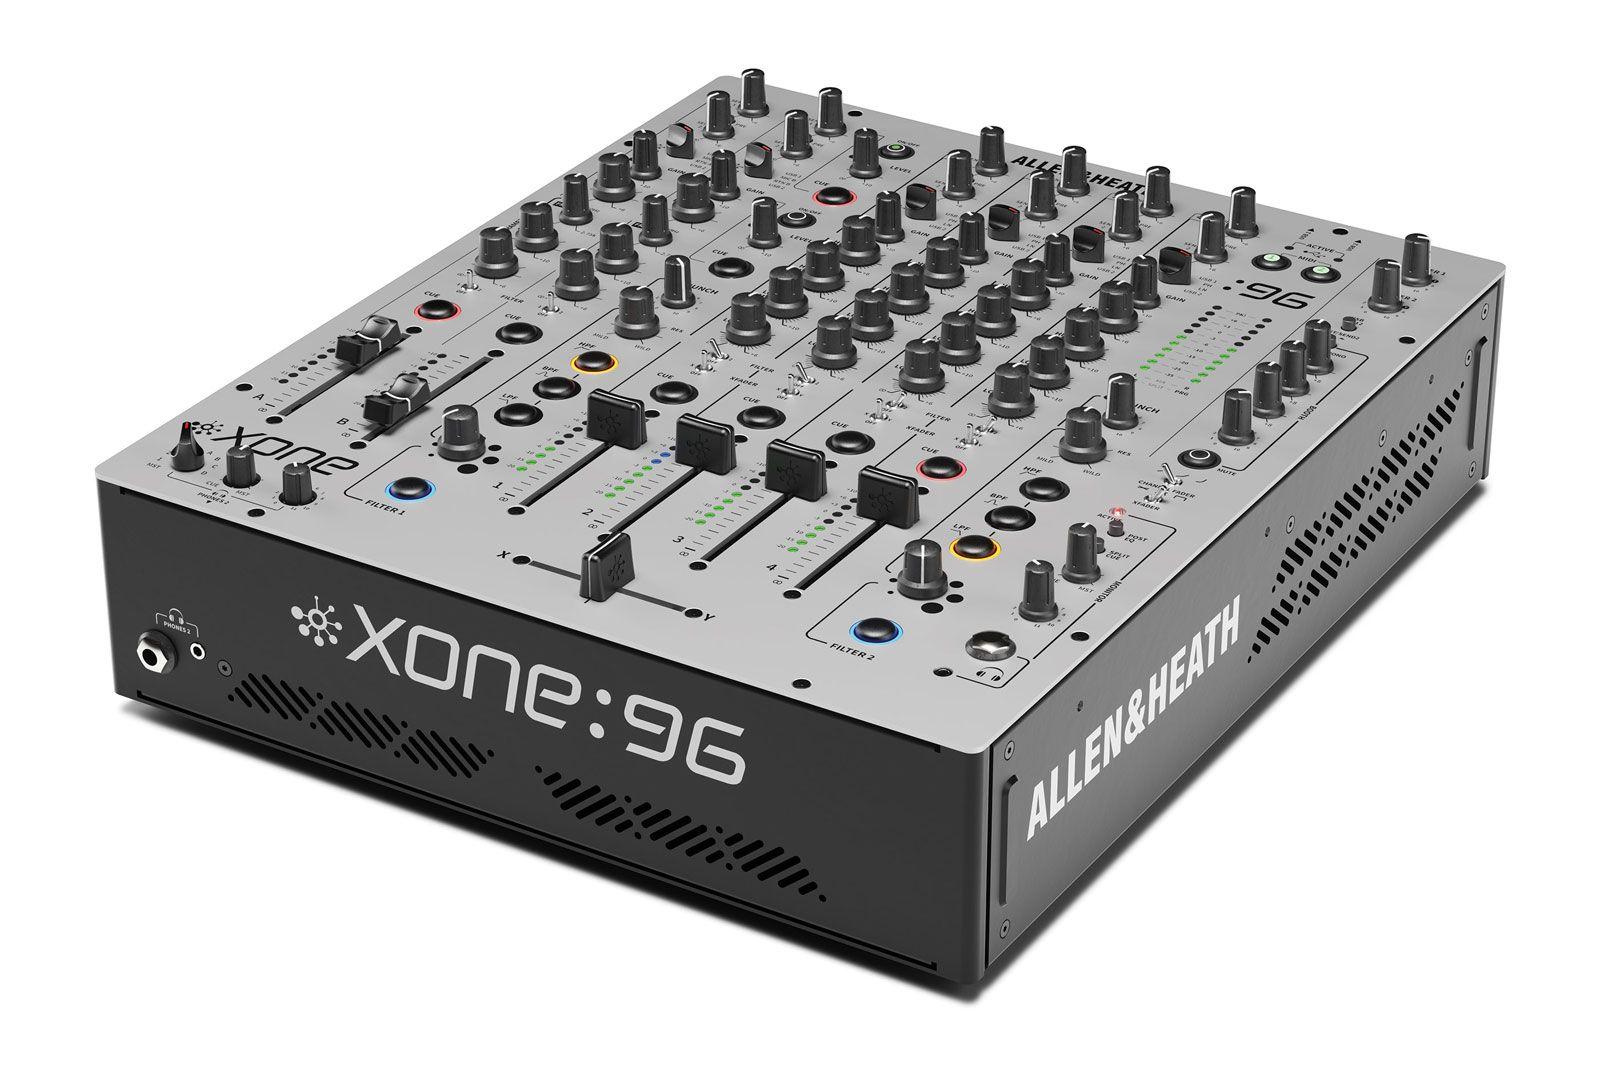 Table de mixage Allen & Heath XONE:96